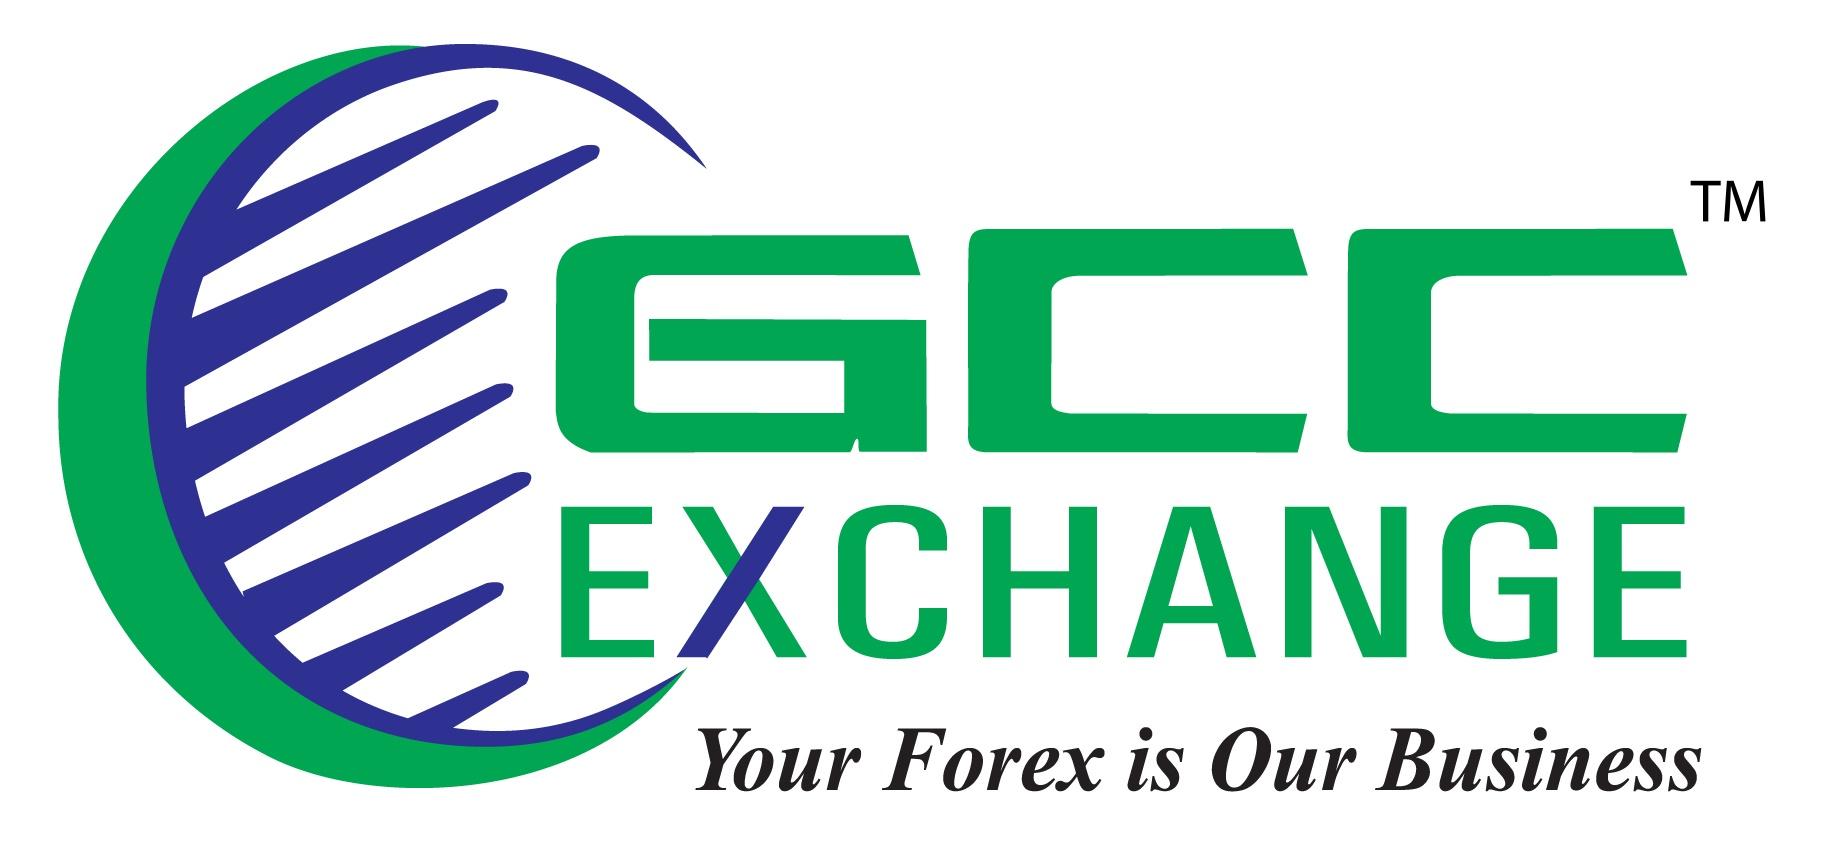 Adx trading signals